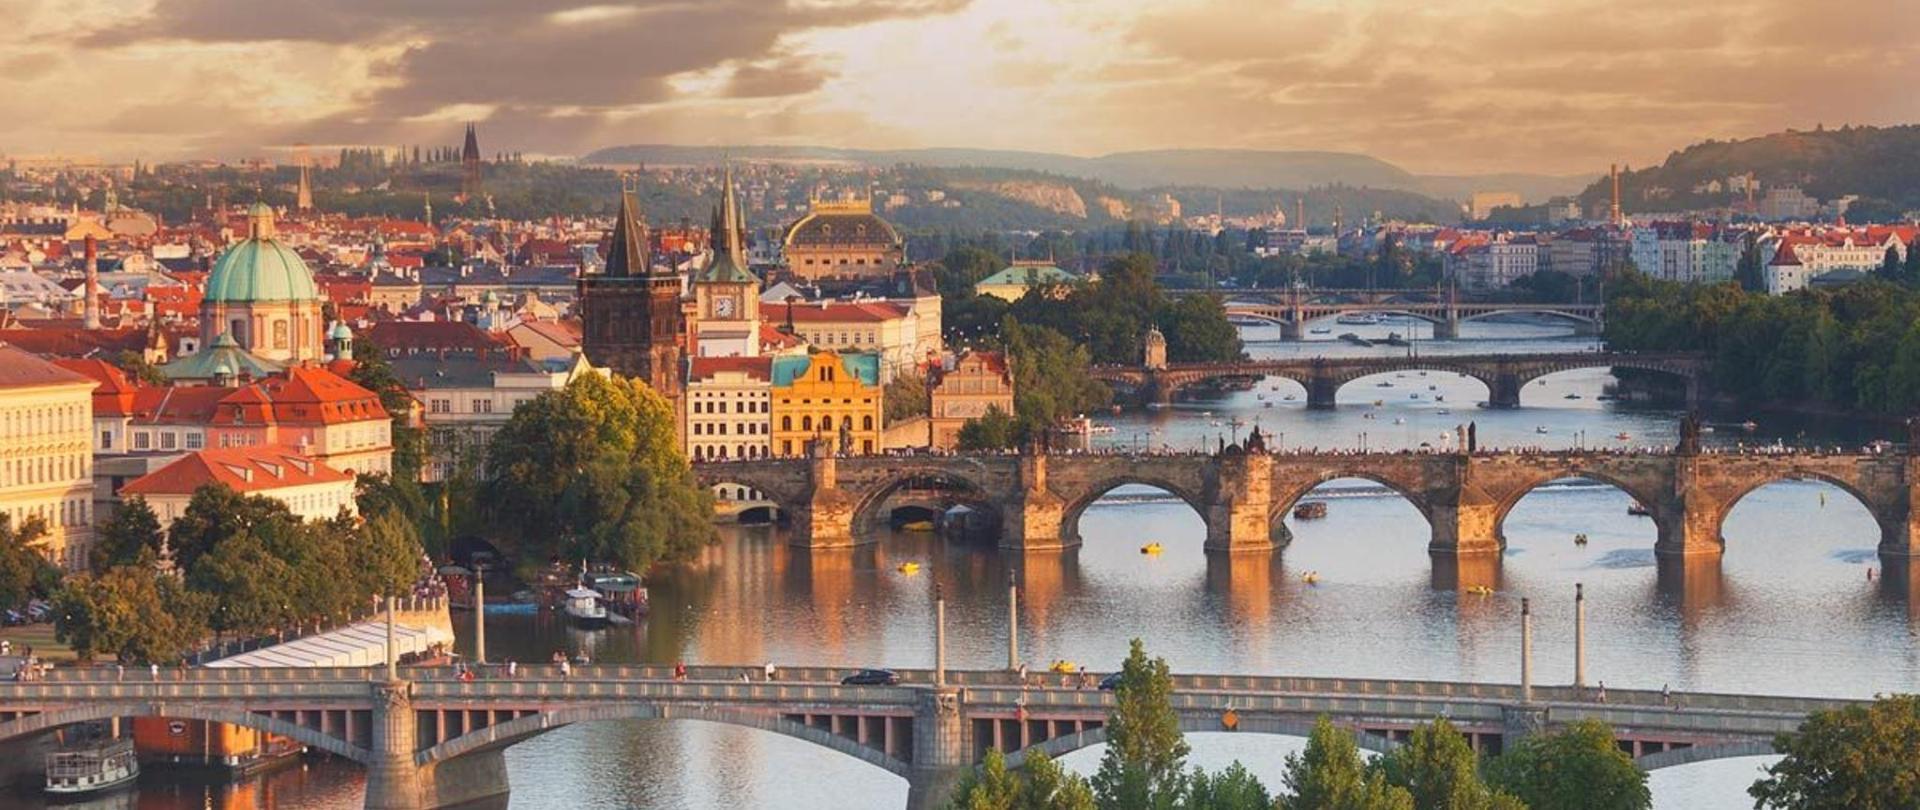 Prague-Bridges-Panorama.jpg